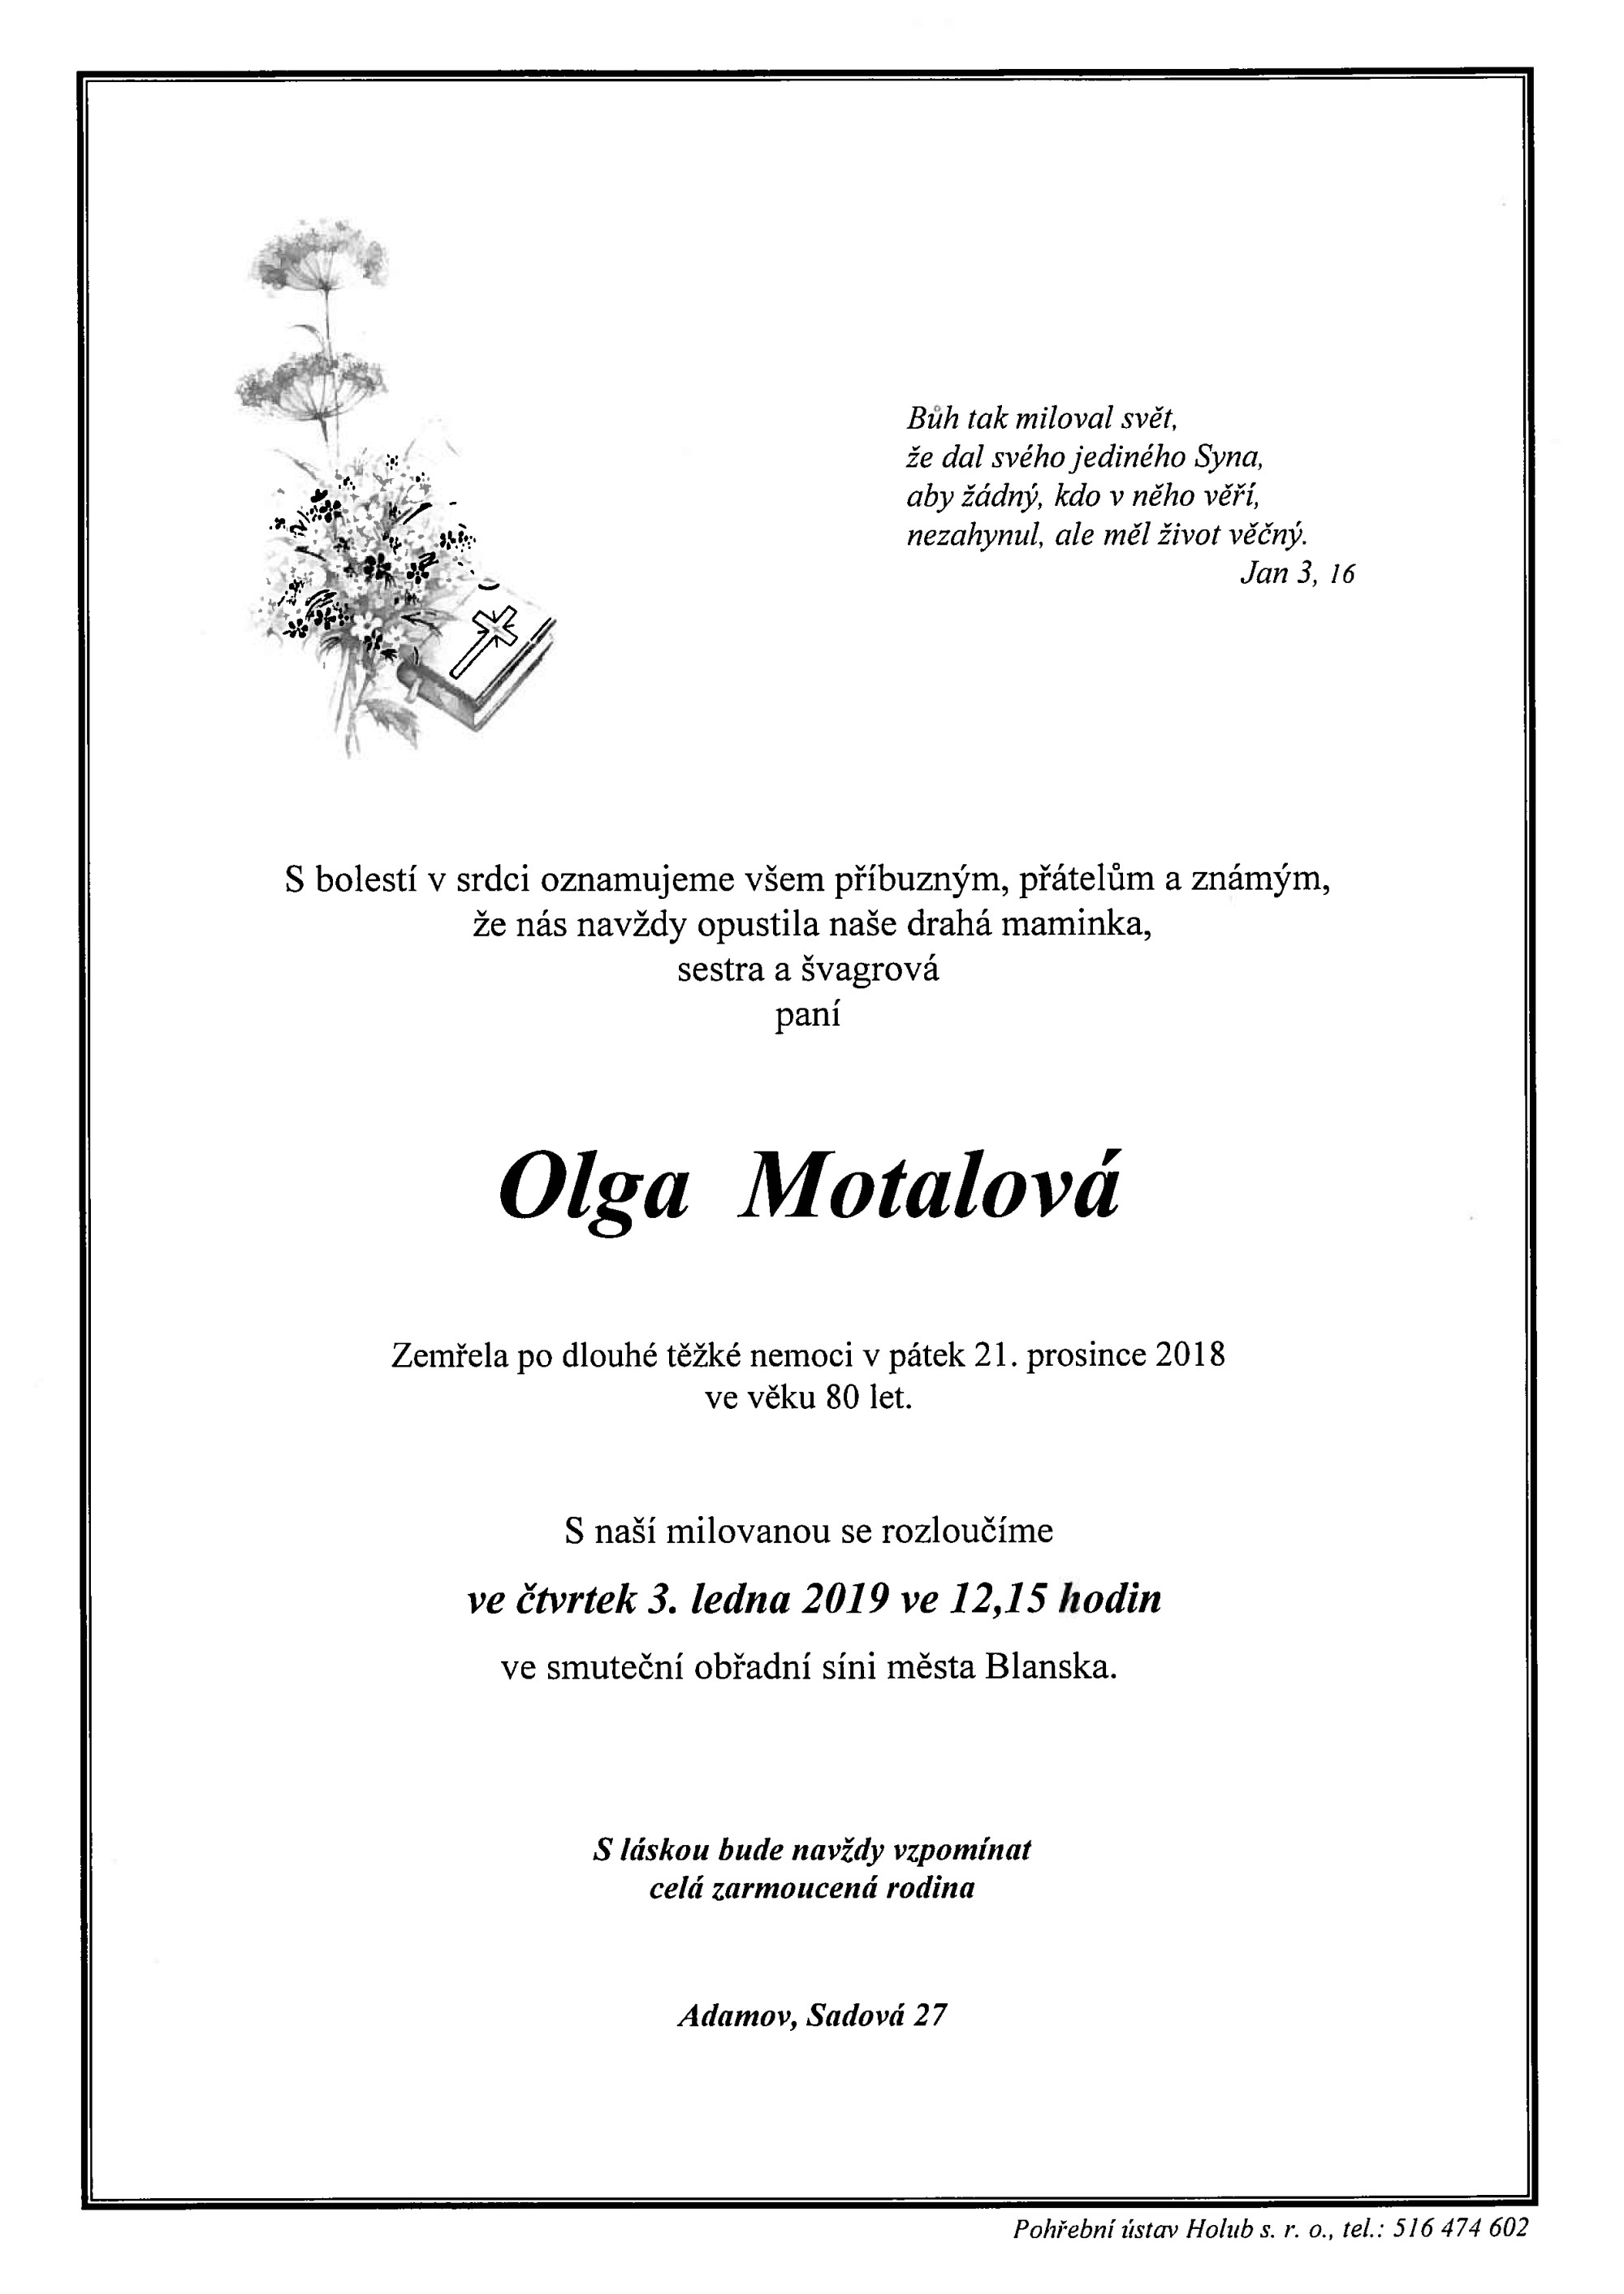 Olga Motalová